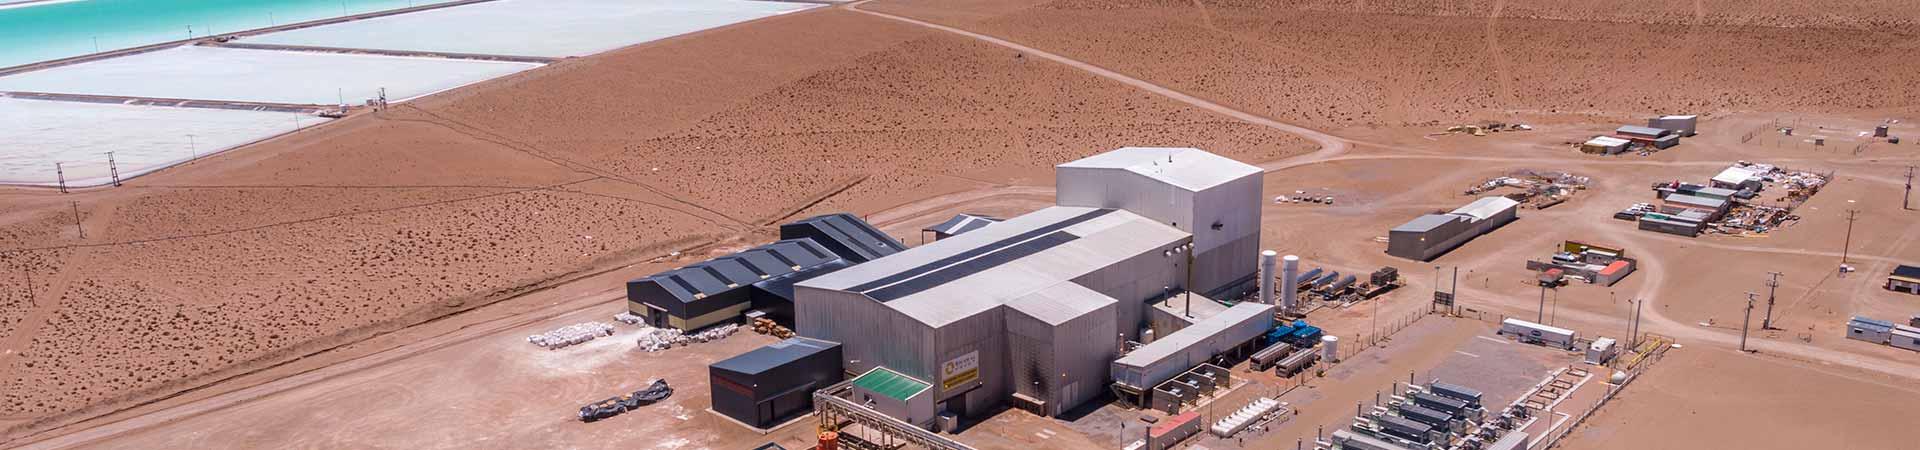 Salar de Olaroz Lithium Facility